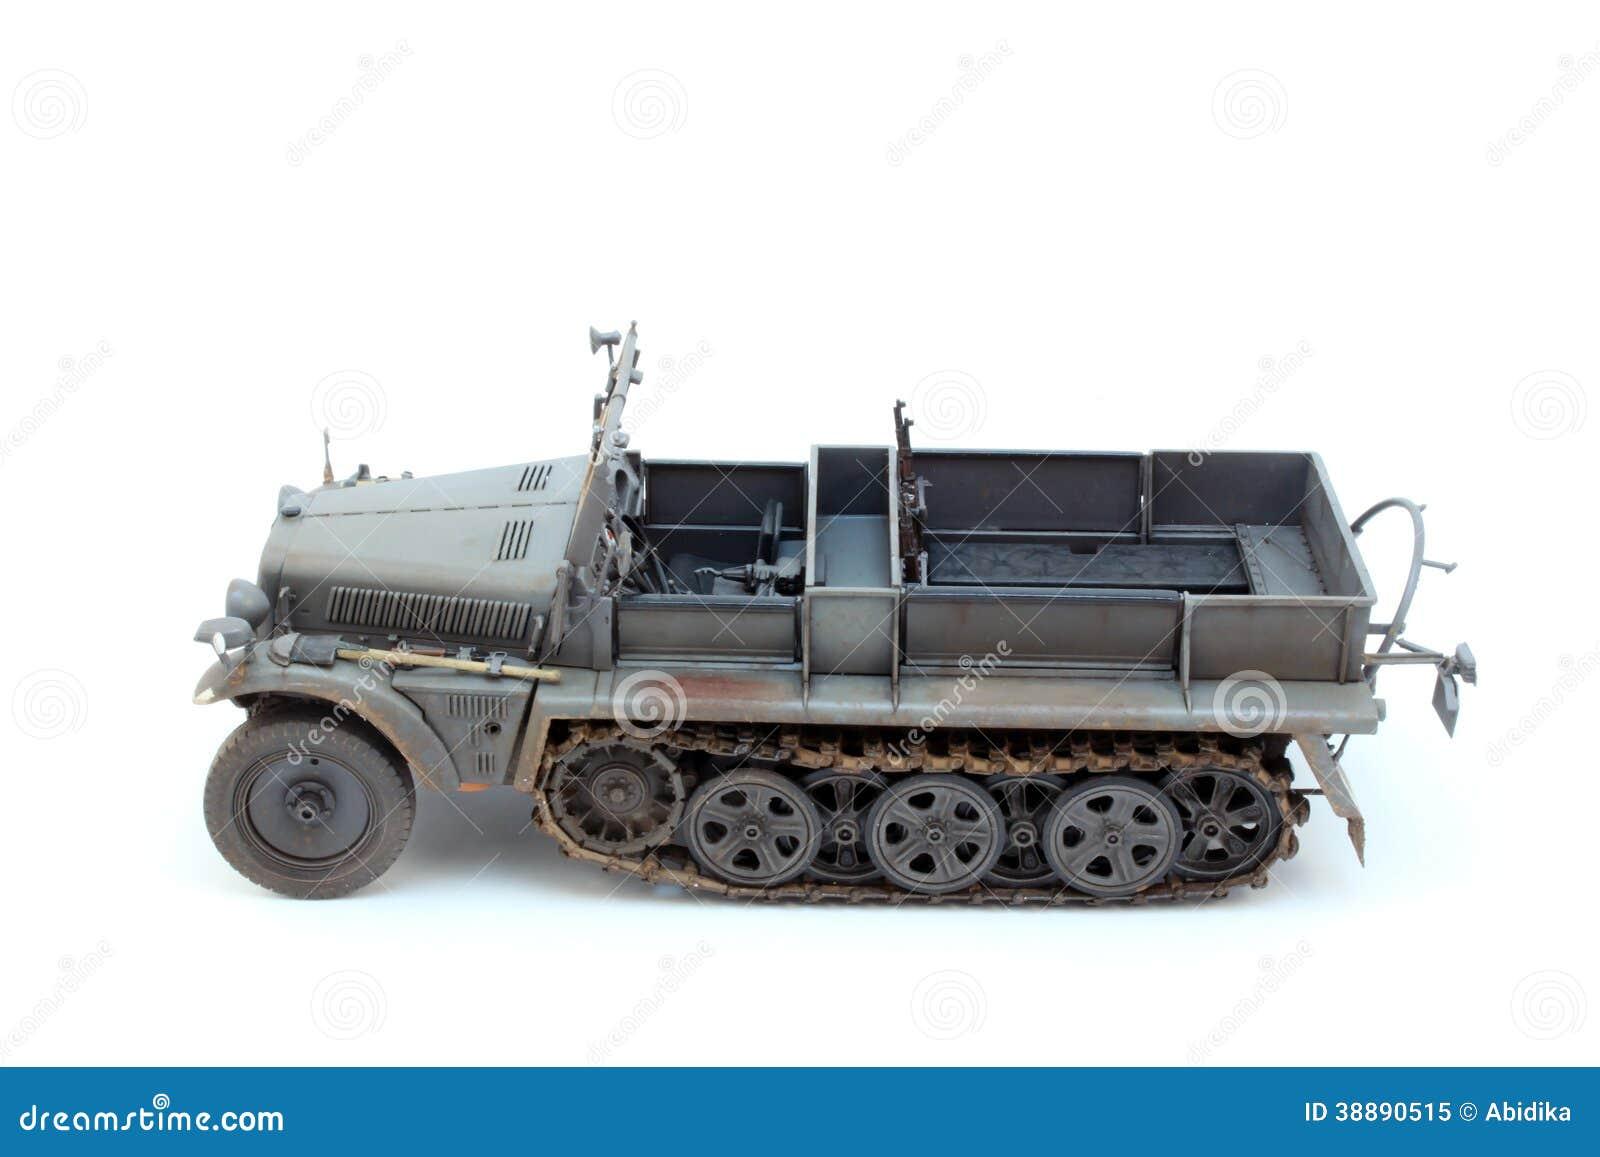 World War II German 1 ton halftrack prime mover somewhere on Ost front ...